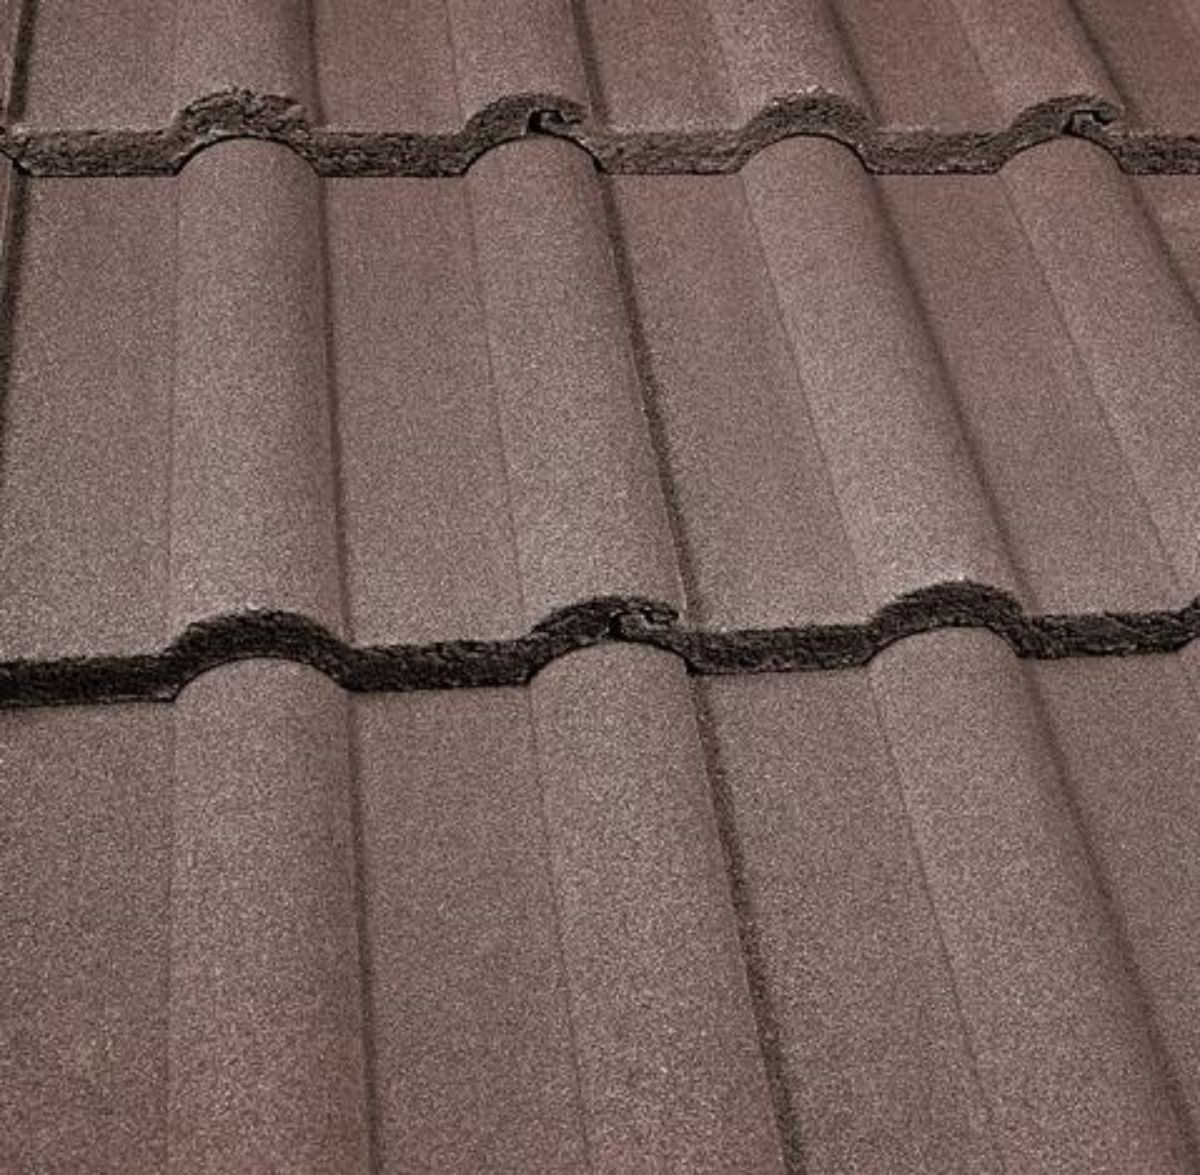 Marley Double Roman Interlocking Concrete Roof Tile